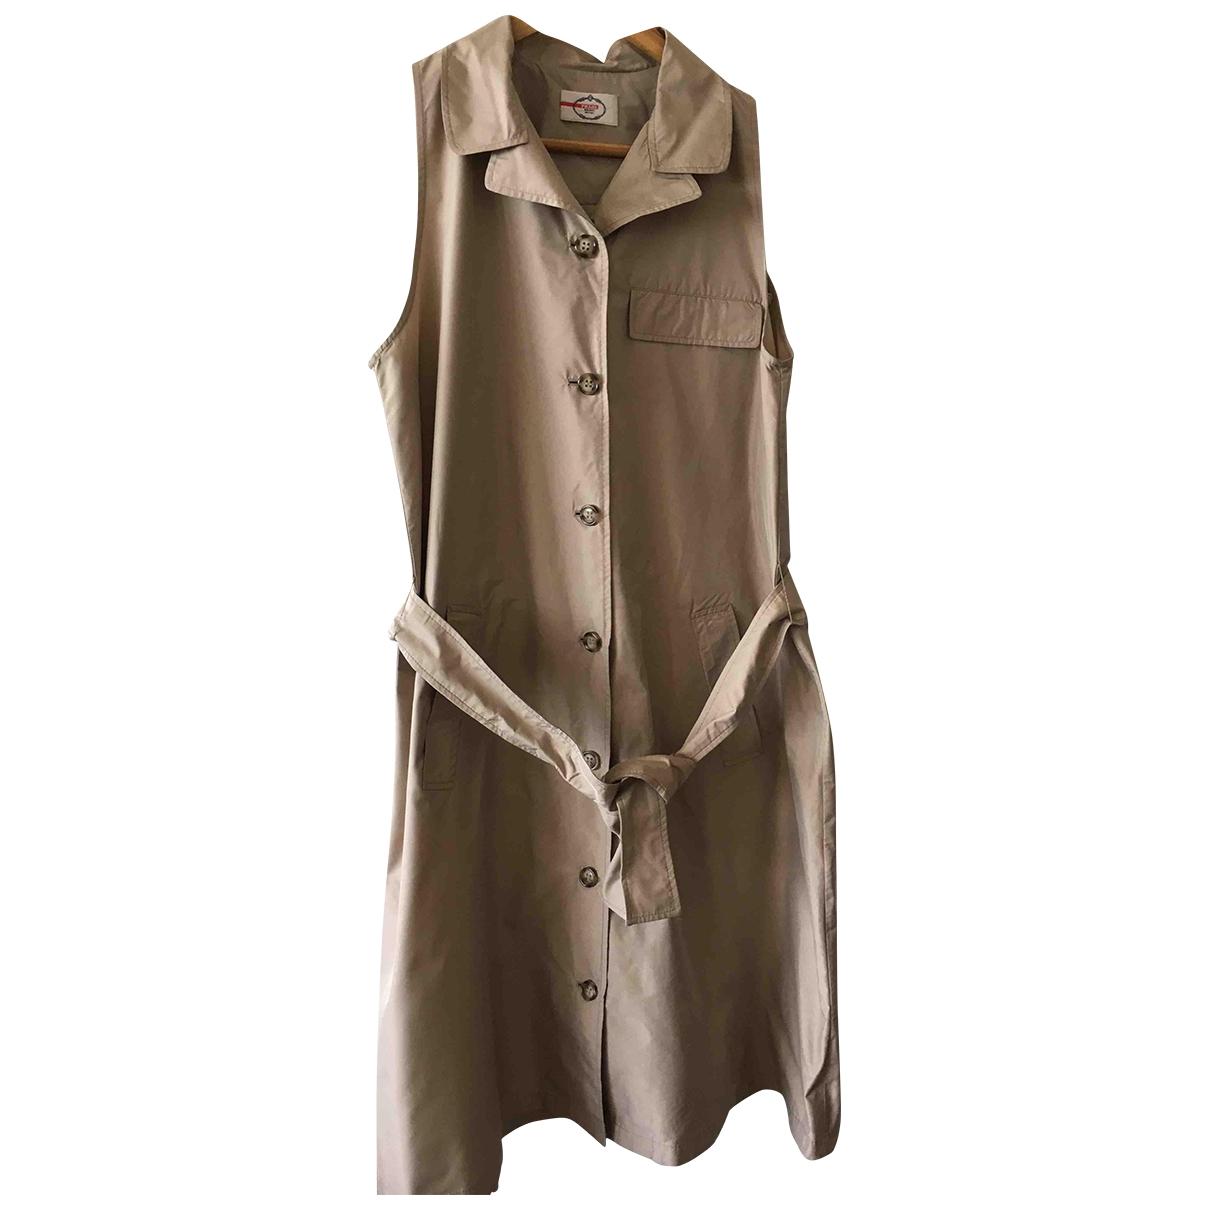 Prada \N Beige dress for Women 40 FR